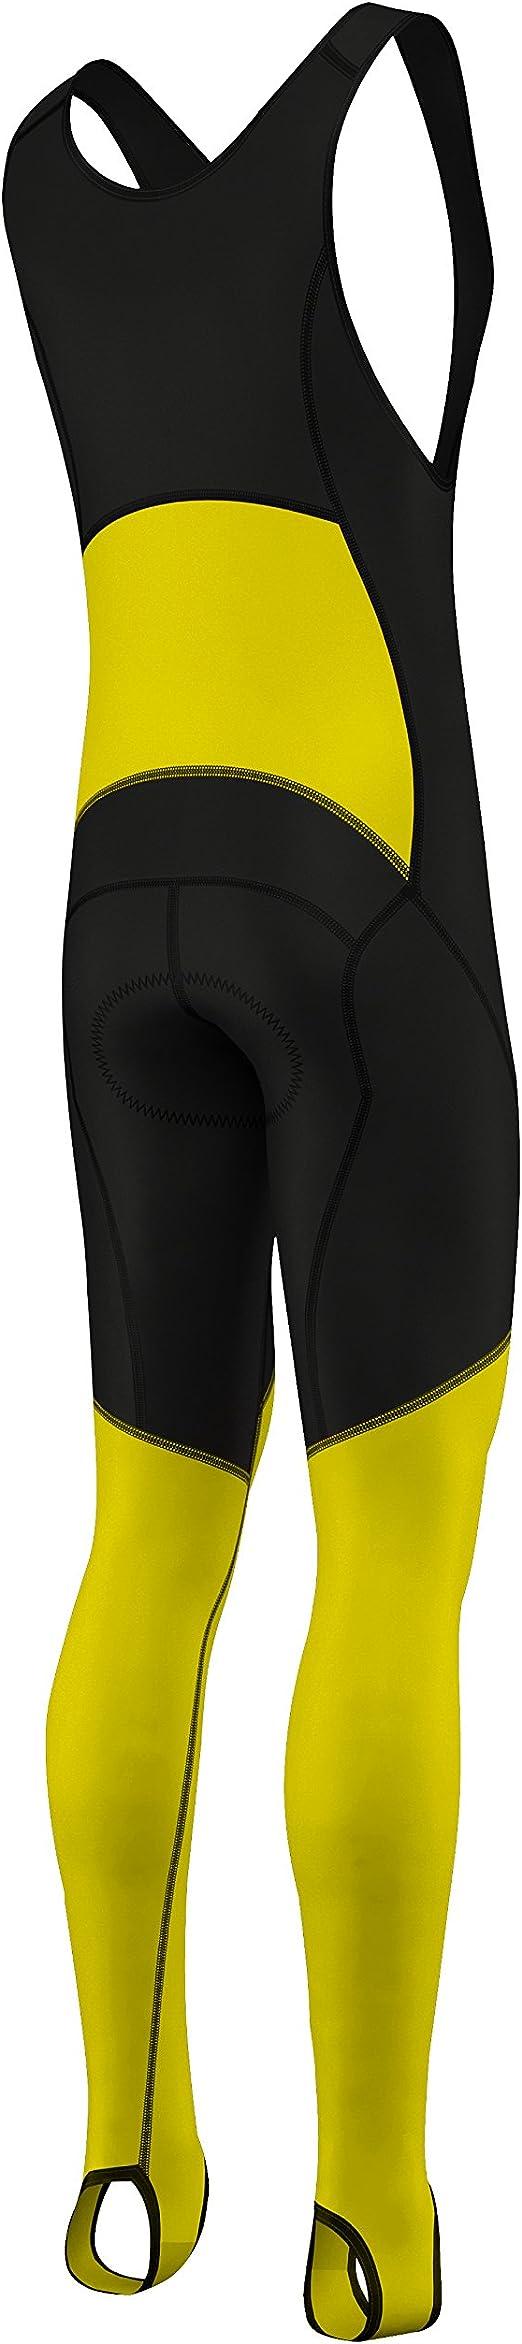 Babero de ciclismo para hombre, tejido térmico térmico Super Roubaix BibTight-Vuelta italiano, tejido elástico térmico, valor por dinero, Hombre, amarillo, S:30